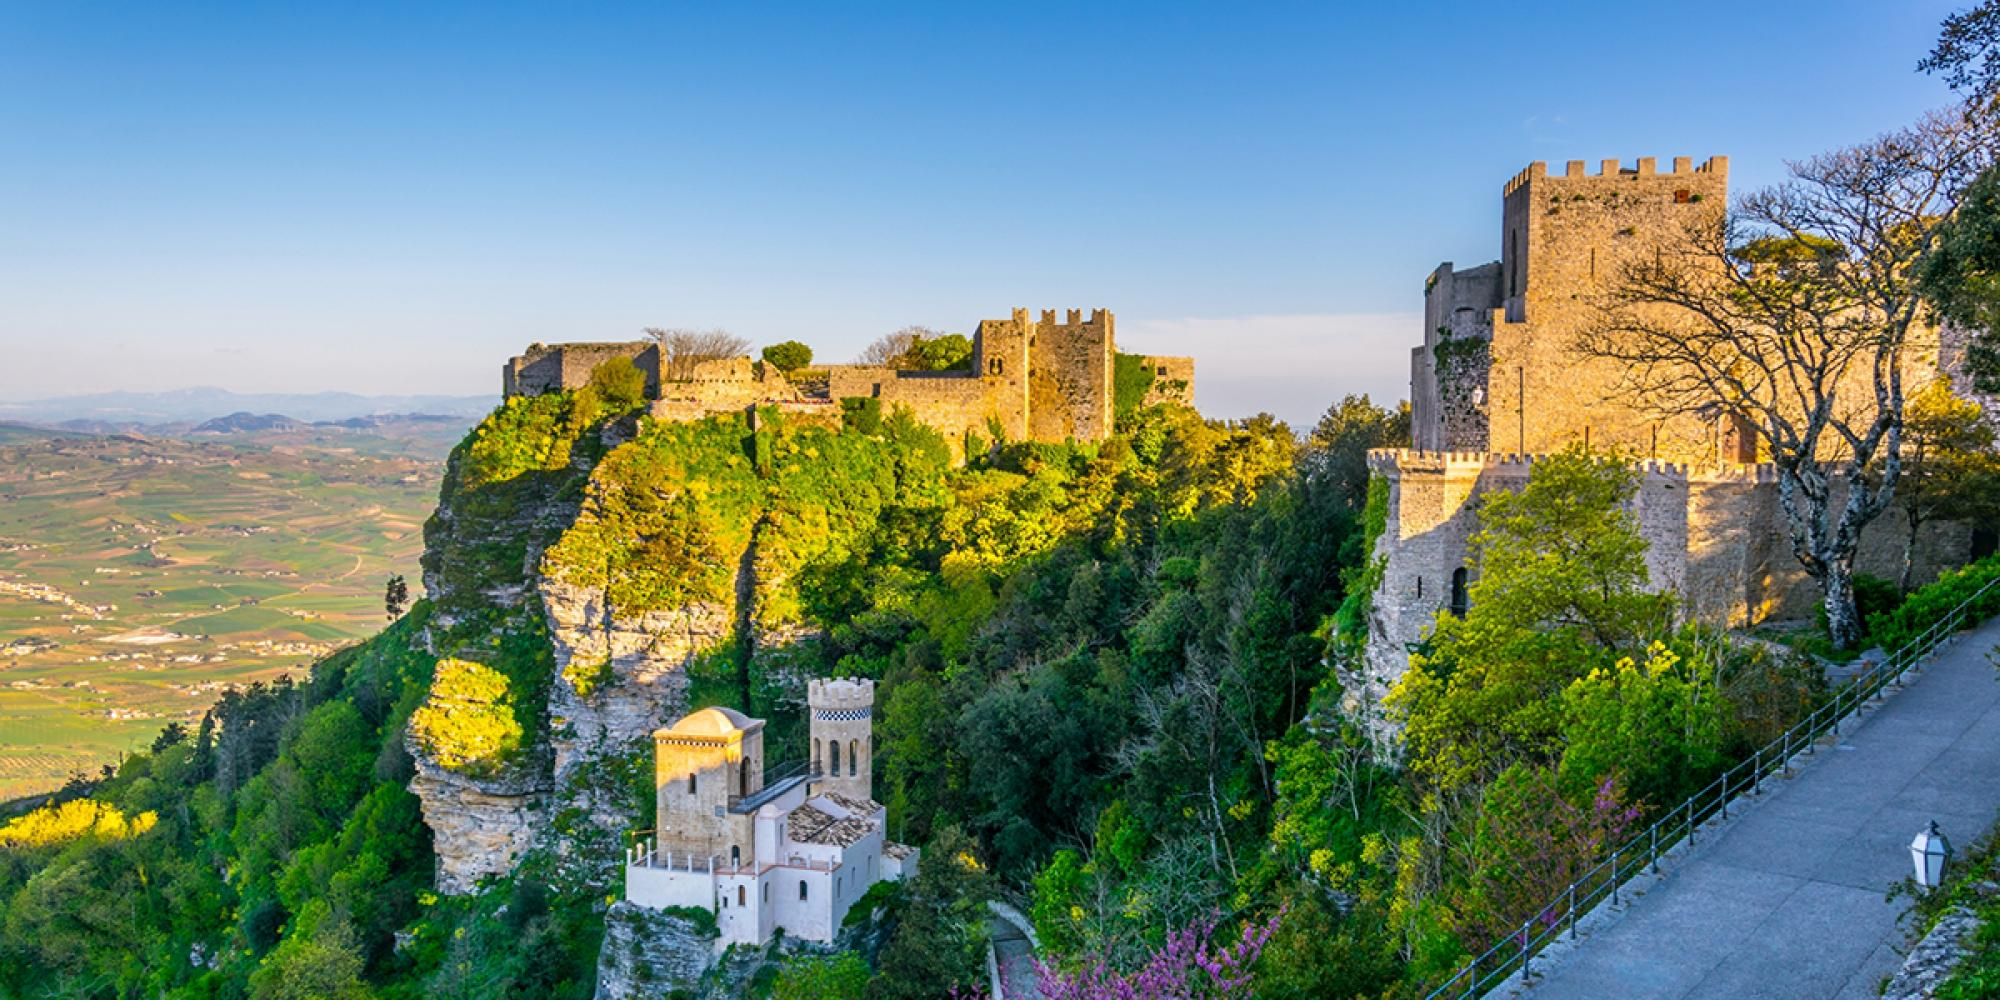 Borghi medievali piu belli d Italia